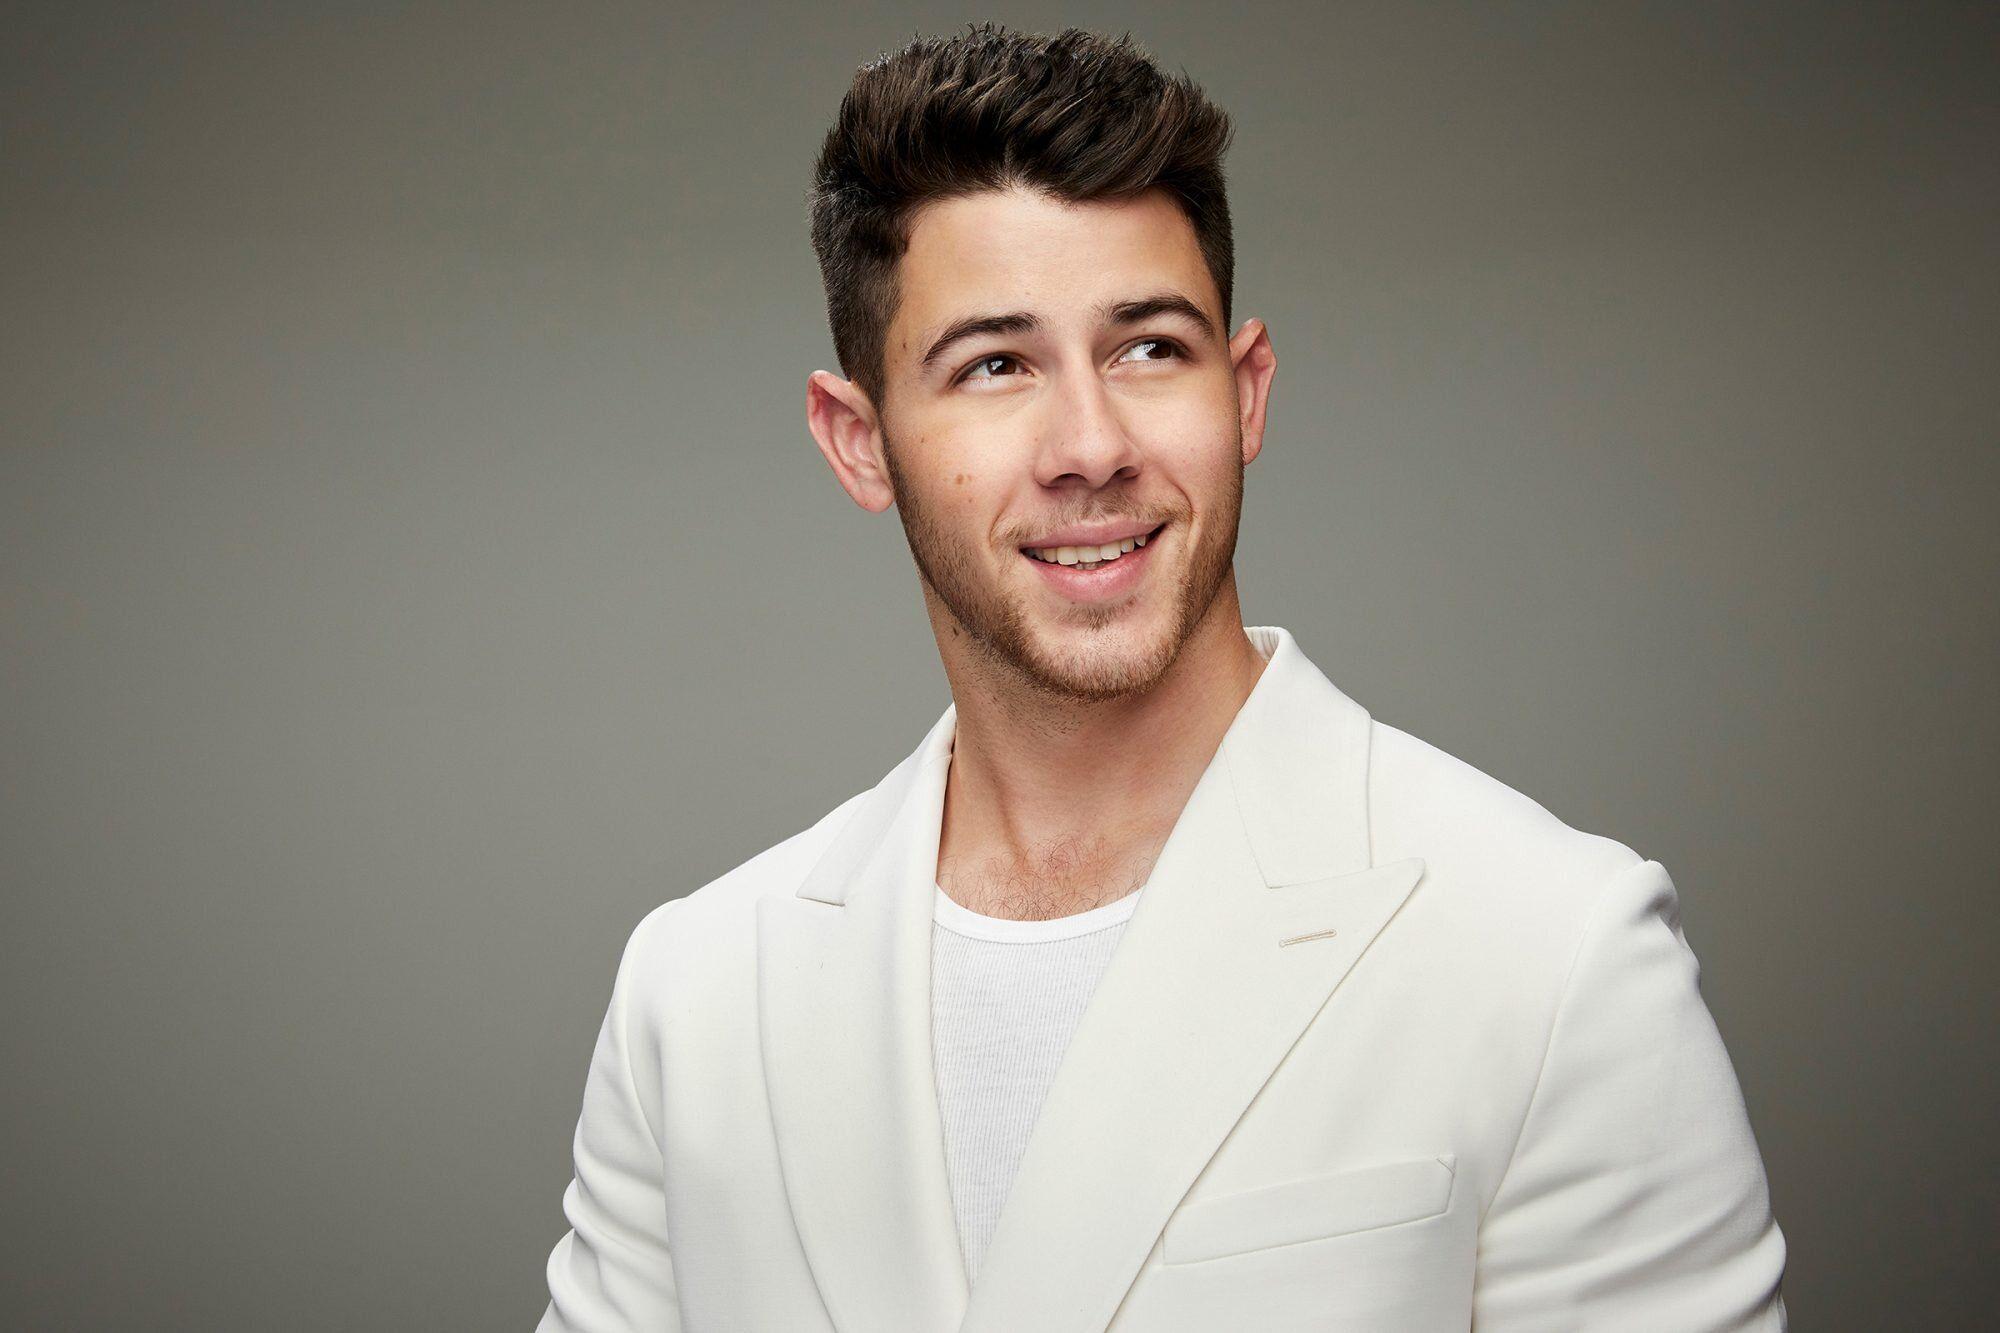 Nick Jonas husband of Indian actress Priyanka Chopra ready to make SNL Hosting Debut, May also get to serve As Musical Guest